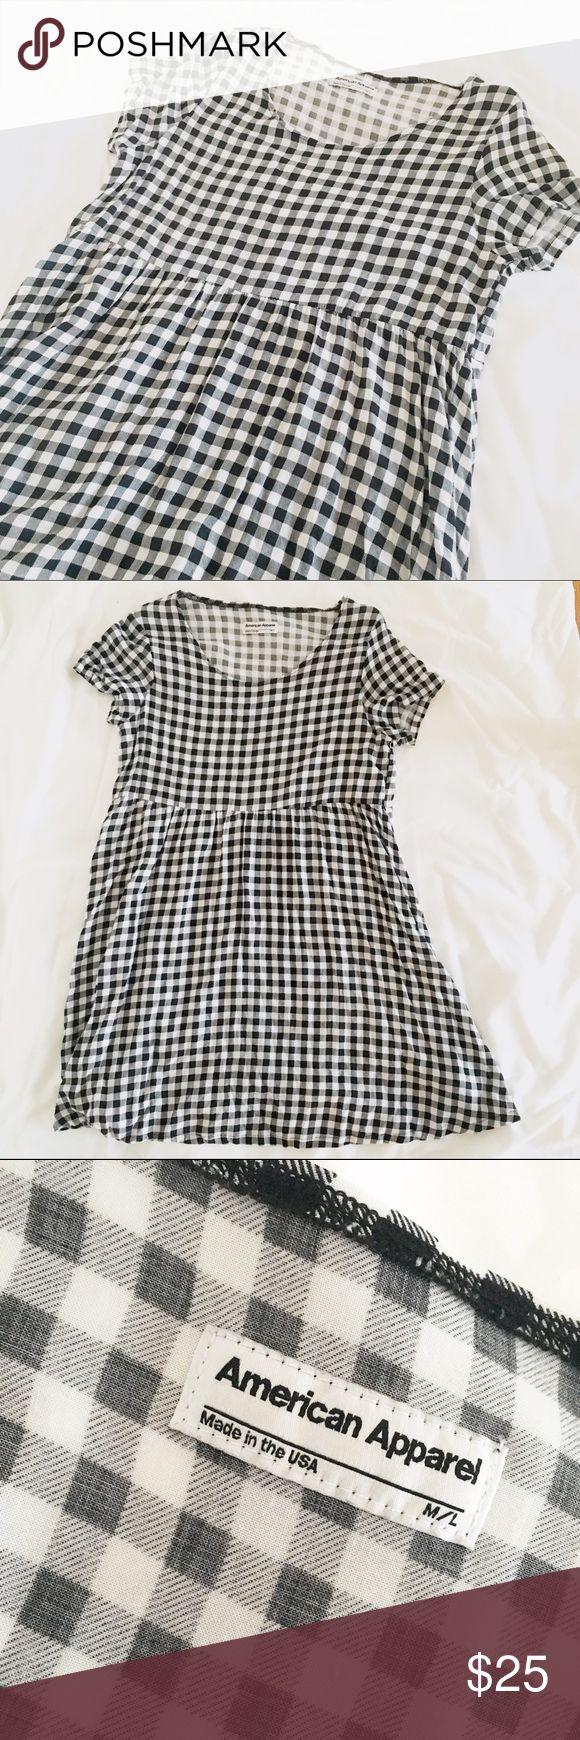 ✨ American Apparel l Gingham Babydoll Dress Gingham print babydoll dress. Very comfy! Size M/L fits sizes 6-10. American Apparel Dresses